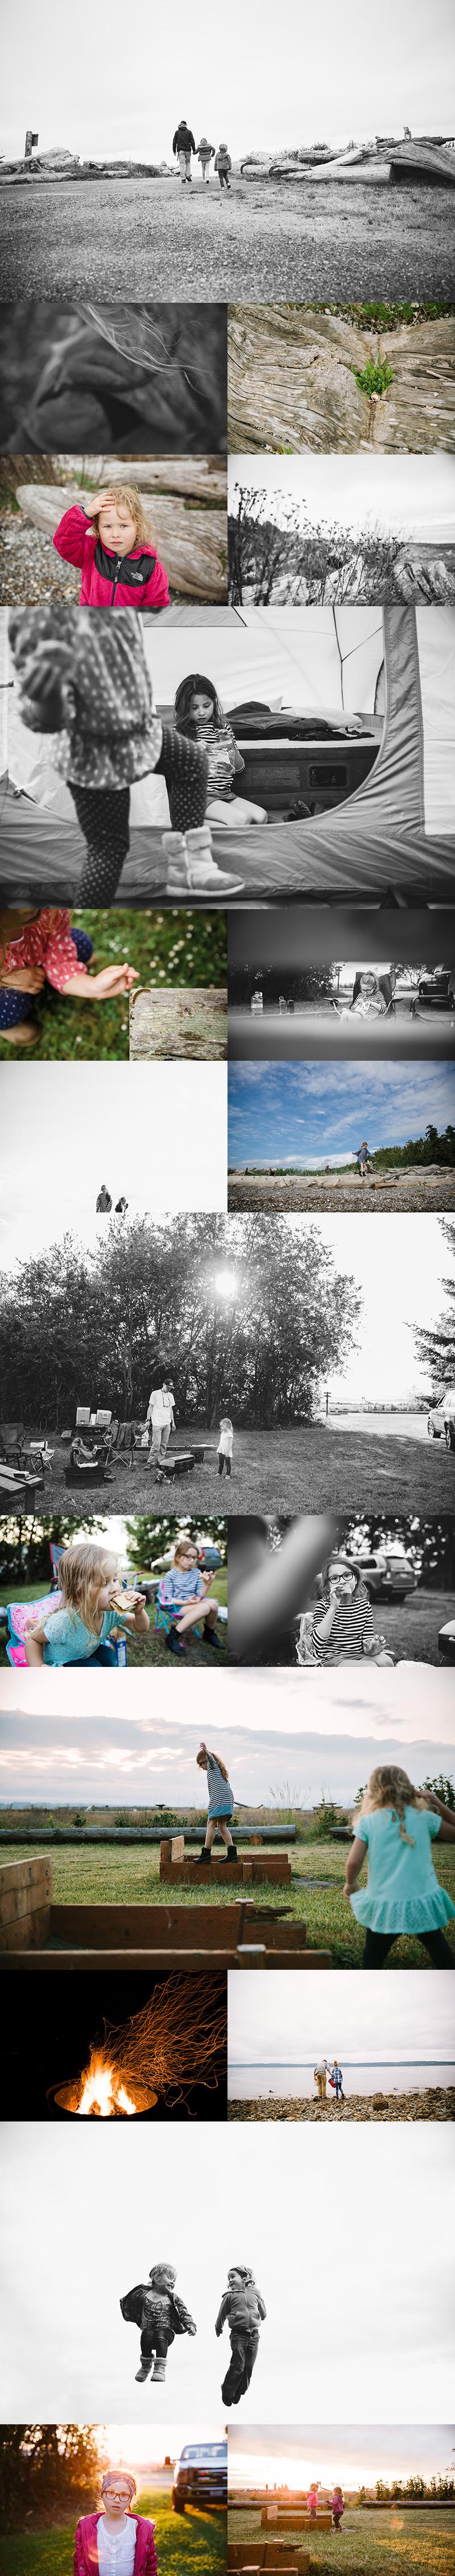 gphotoco_camping.jpg